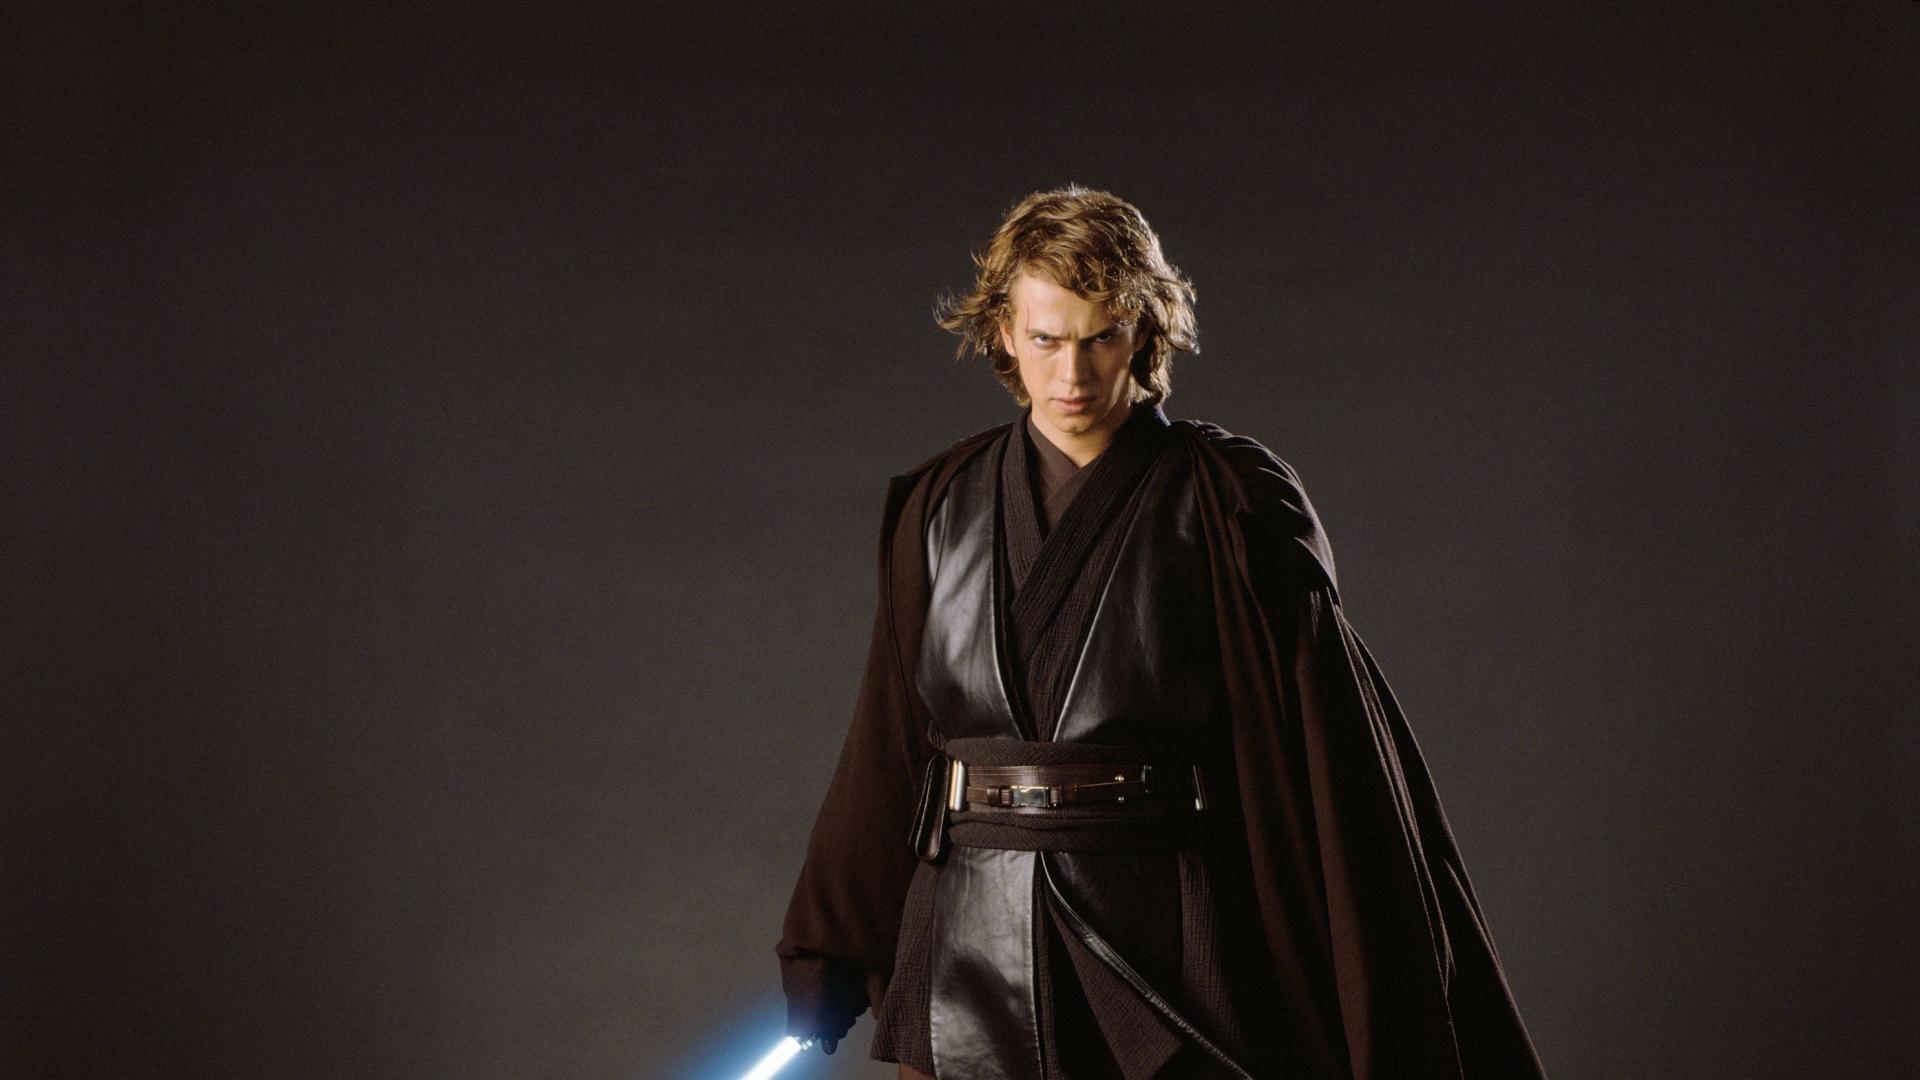 Anakin Skywalker Wallpaper for Desktop 1920x1080